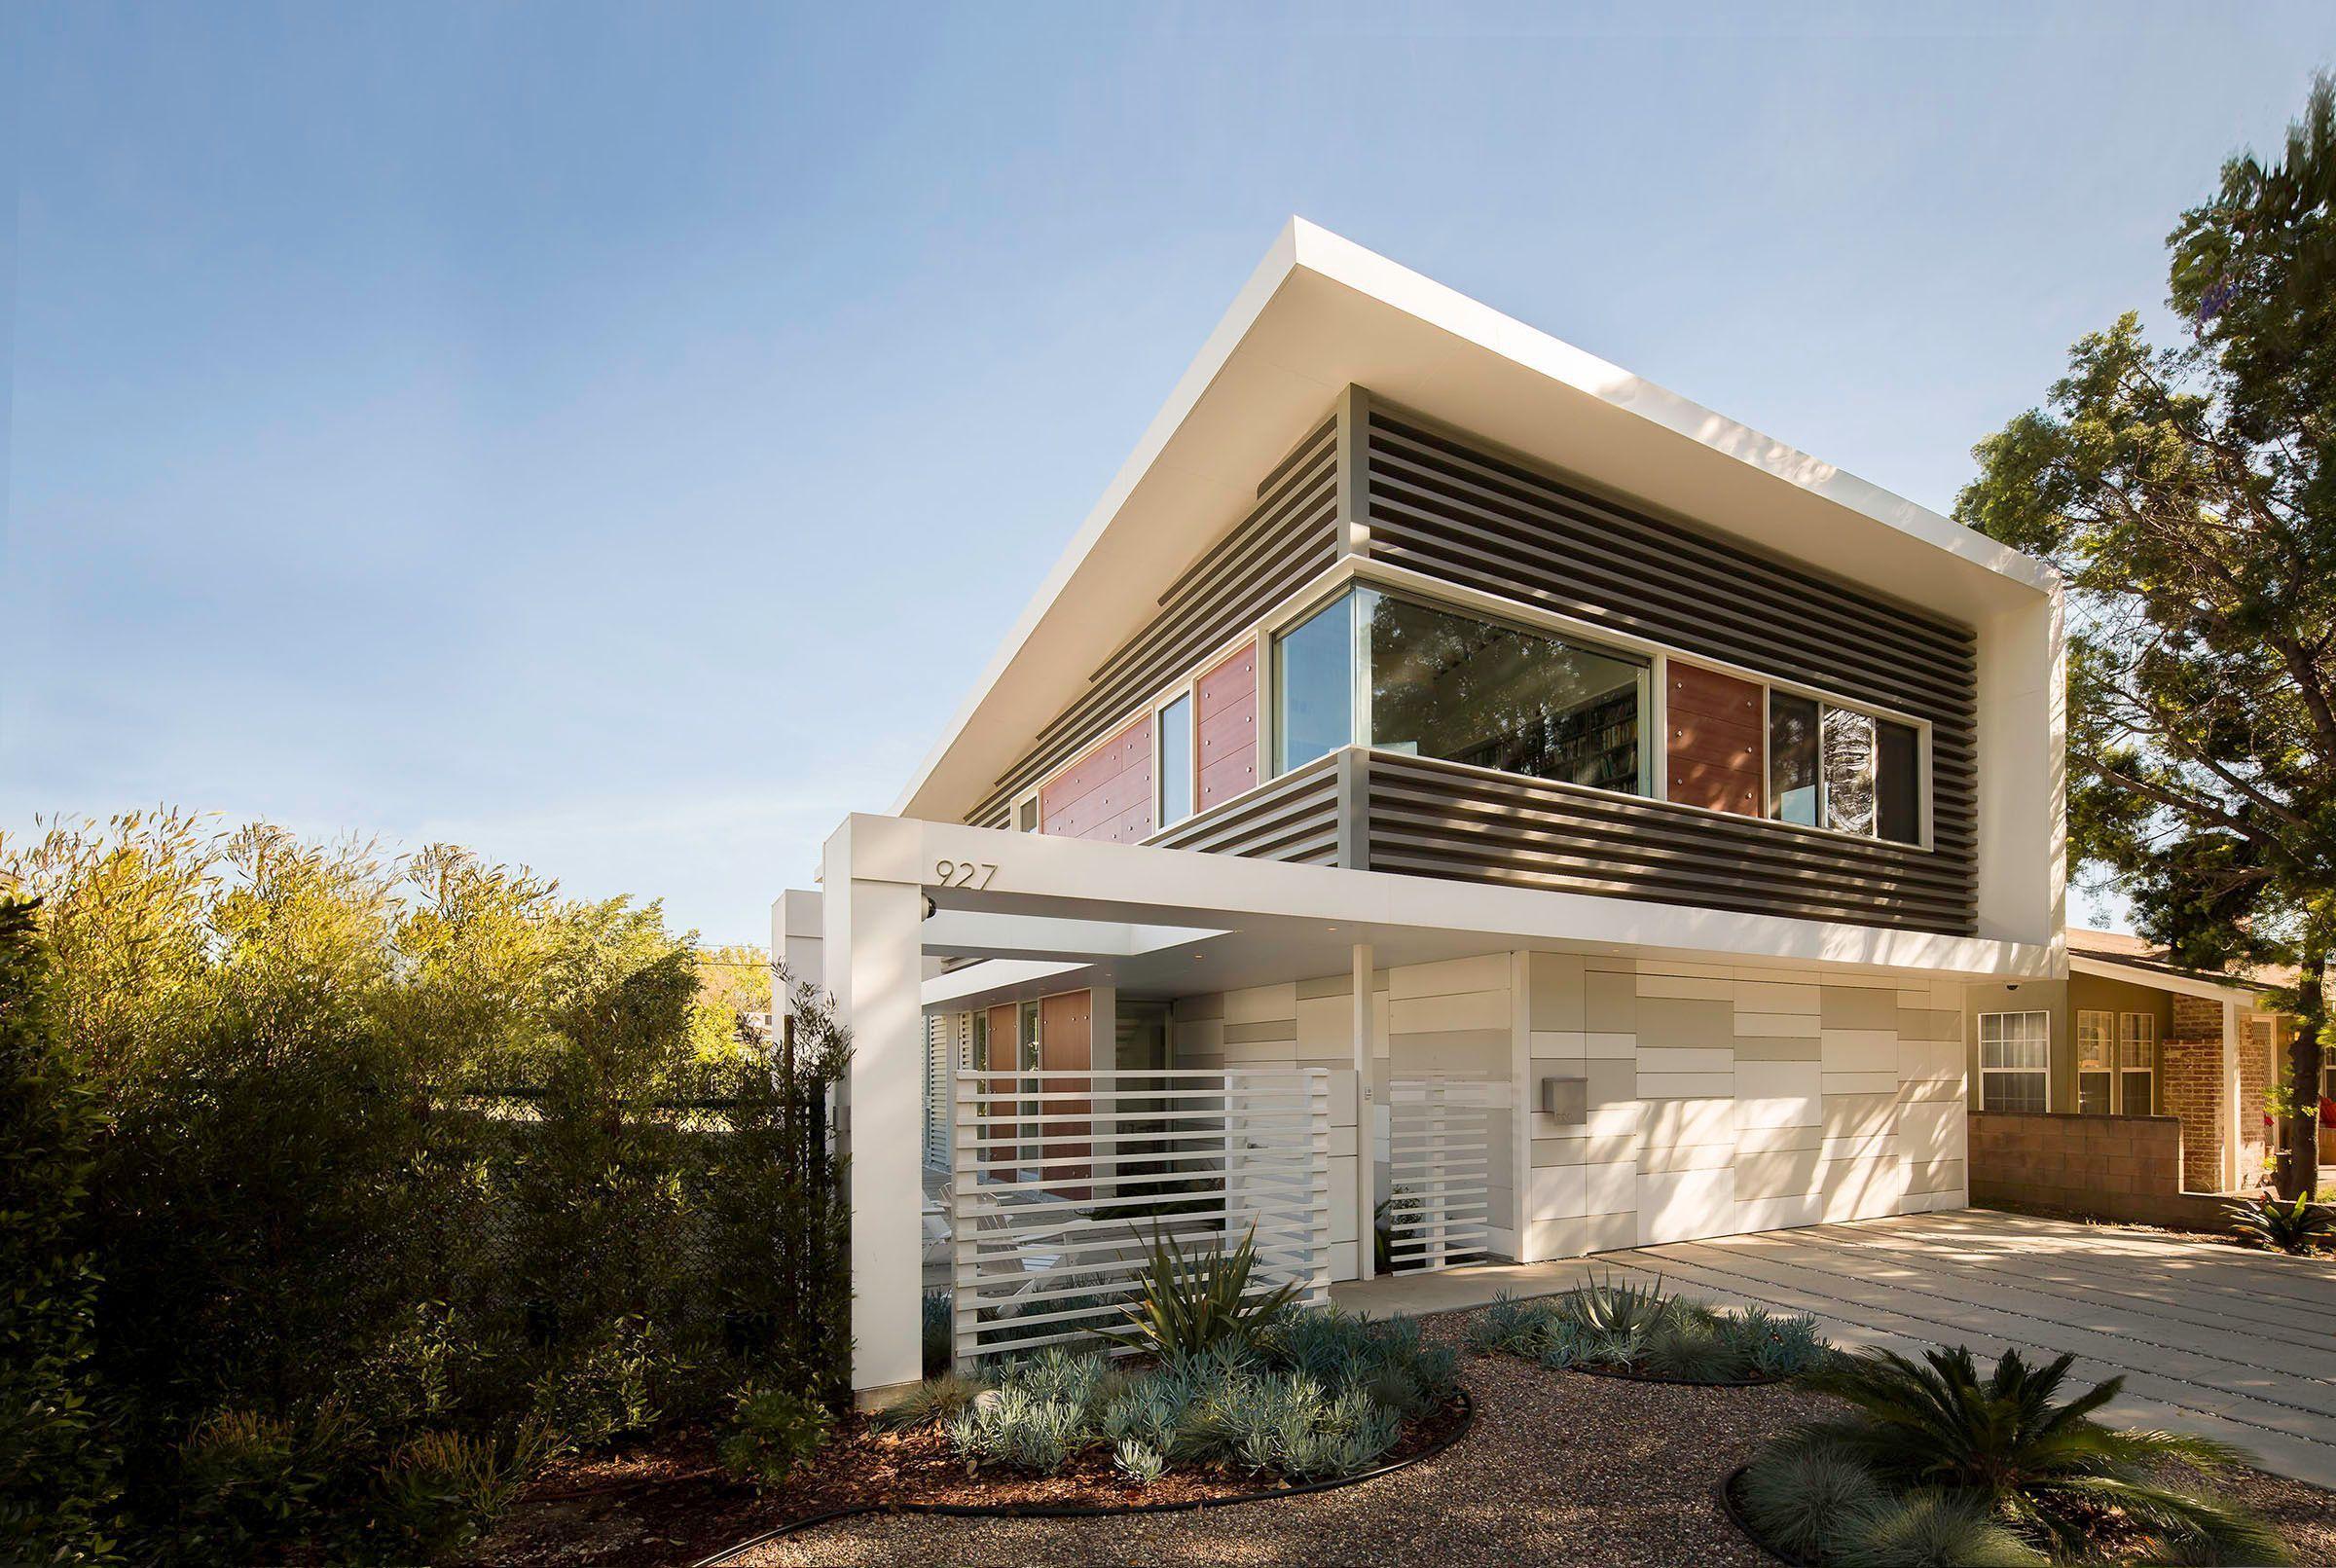 Modern Modular Homes Southern California | Taraba Home Review